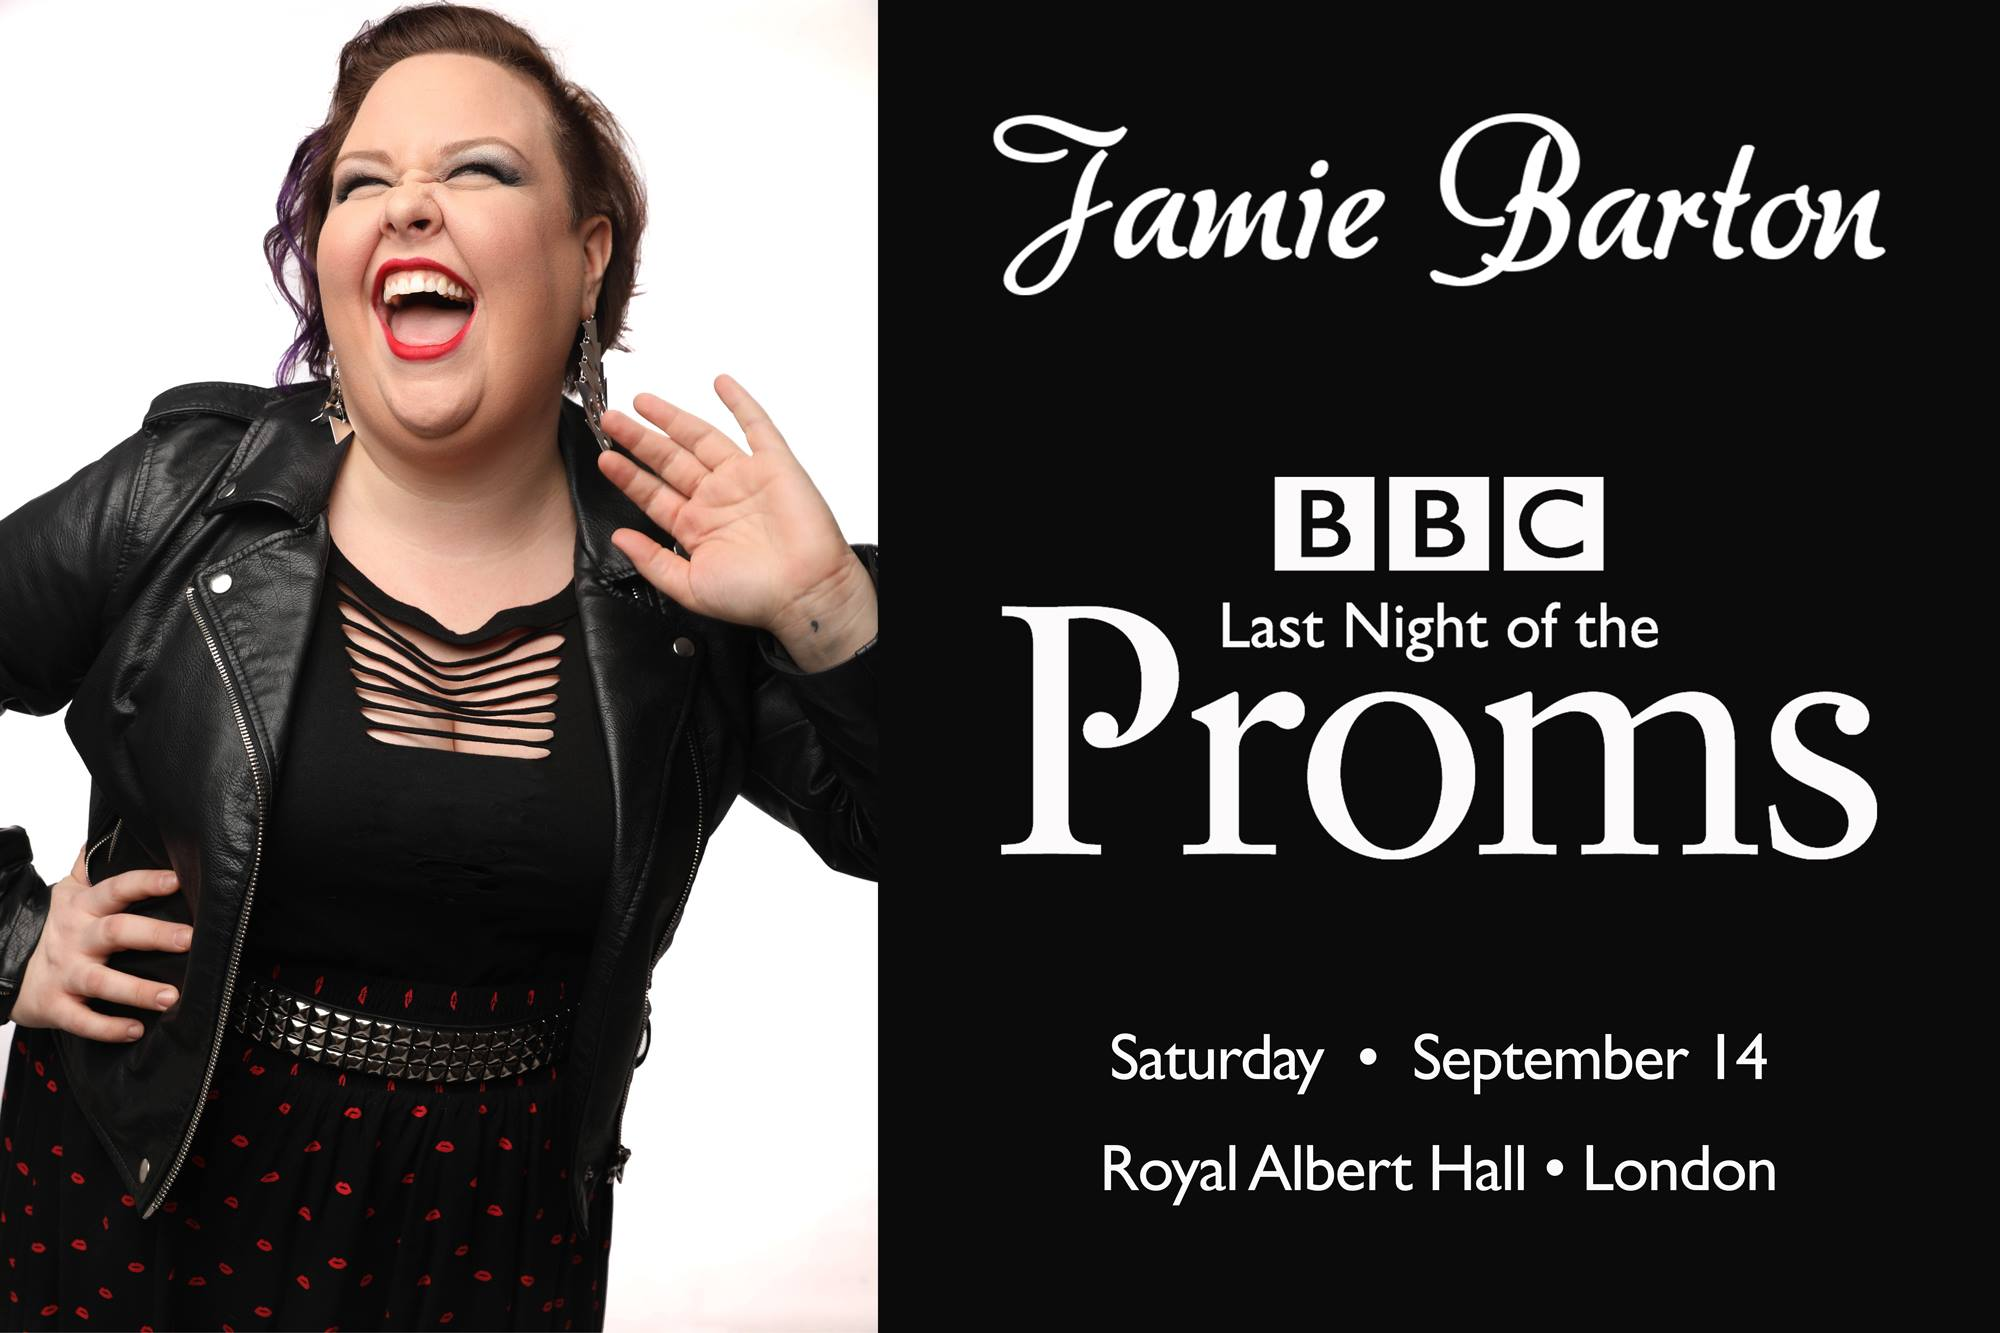 Bisexual pride will rule Britannia at BBC's Last Night of the Proms